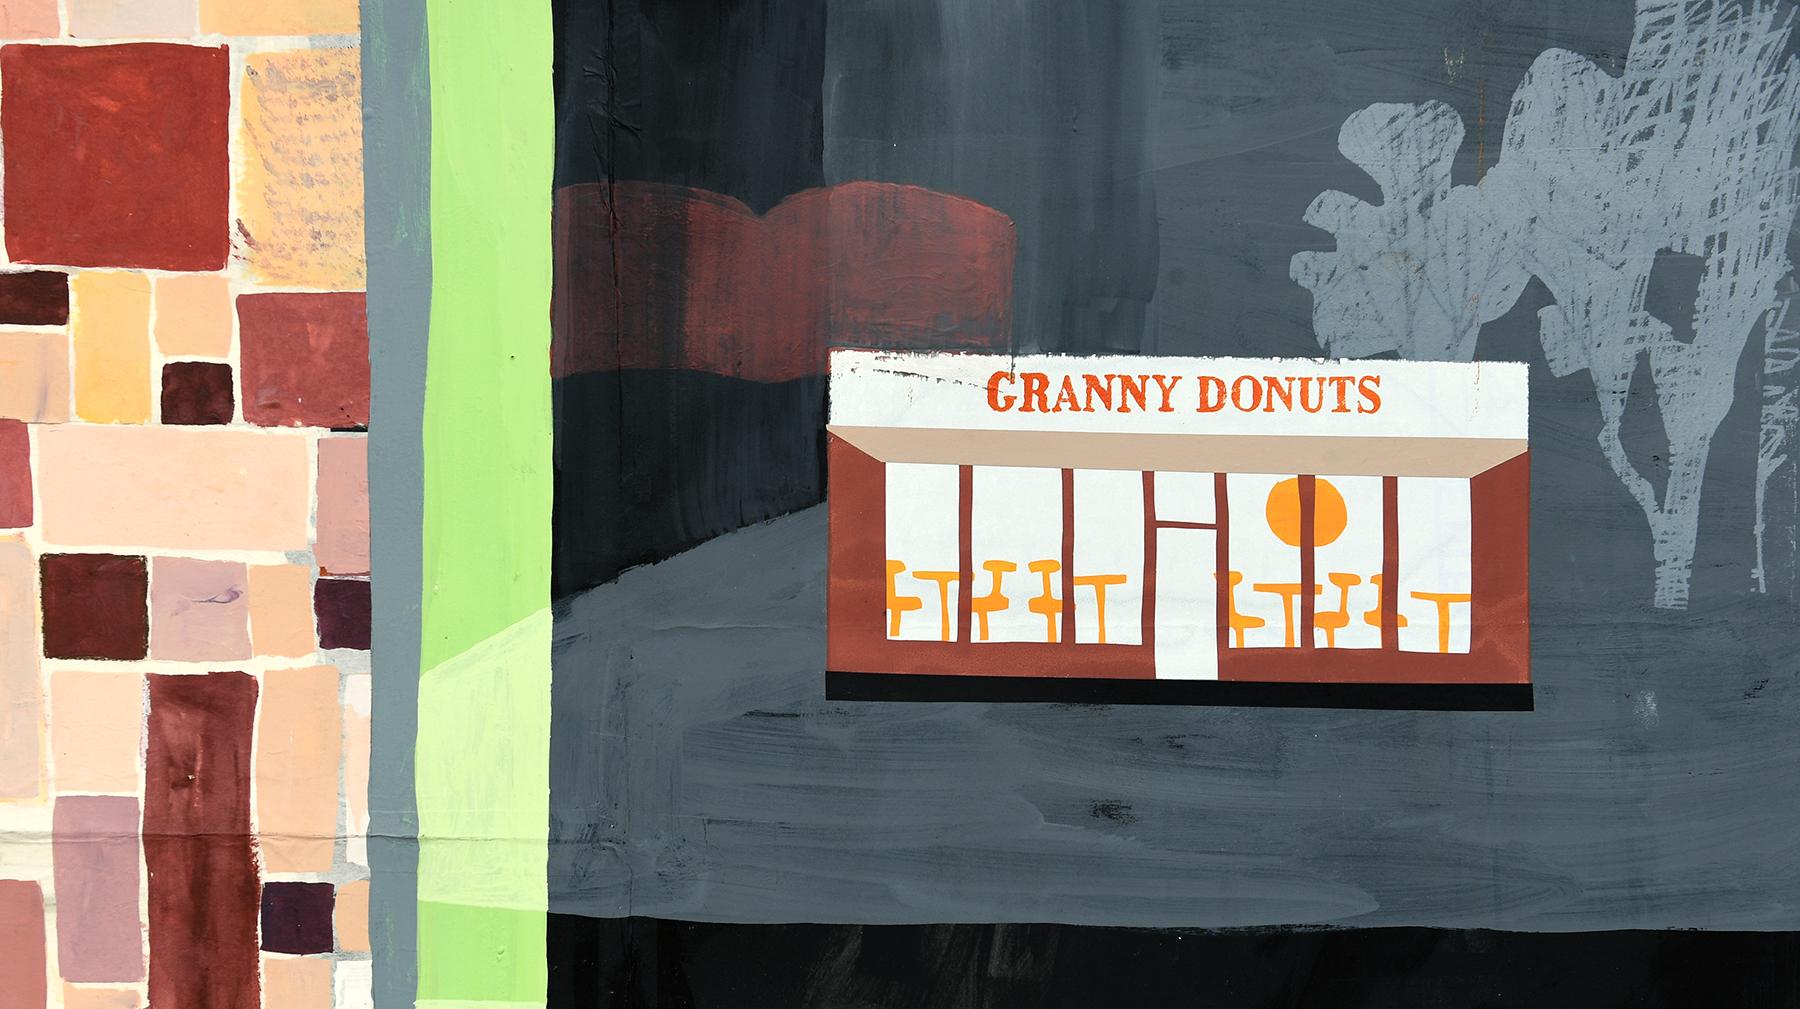 Granny Donuts by Carolyn Swiszcz